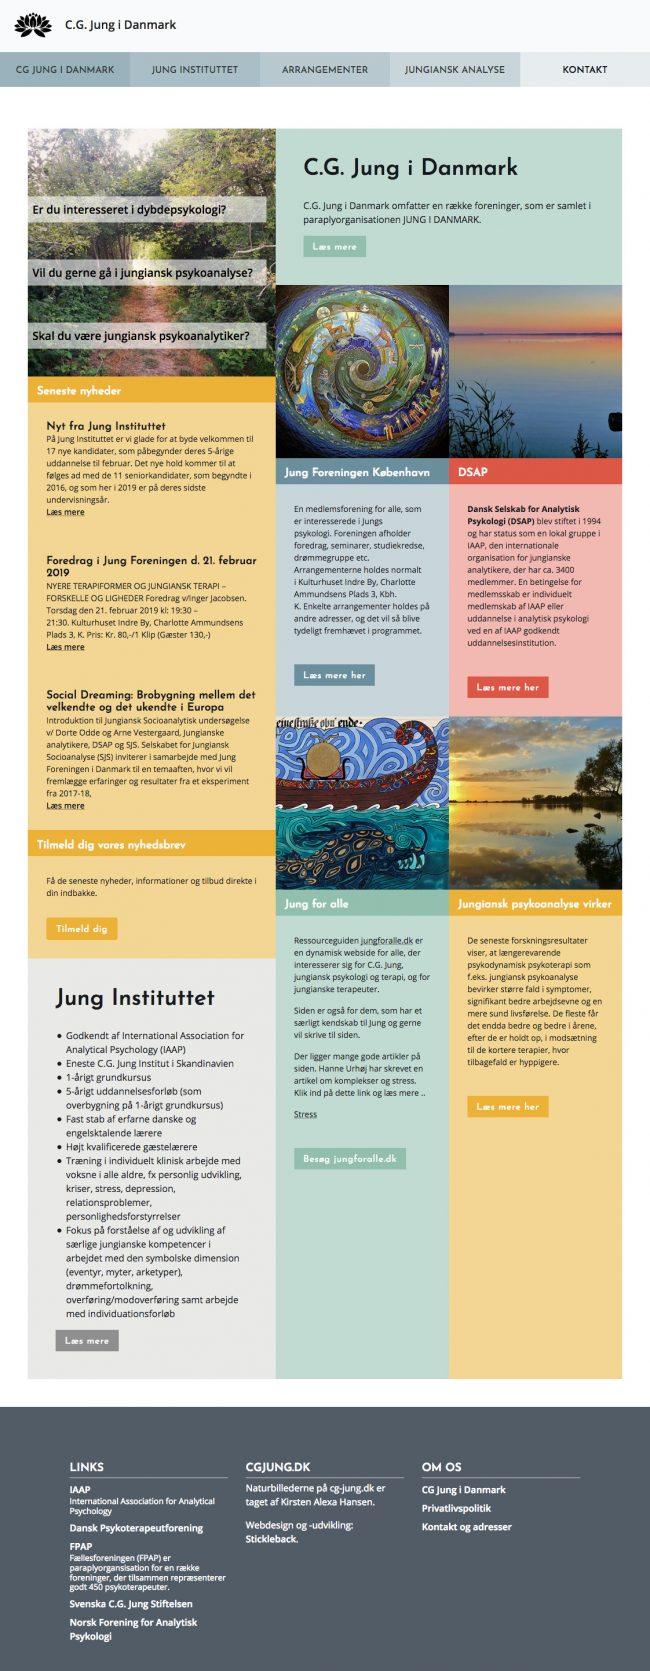 cg-jung.dk - screenshot